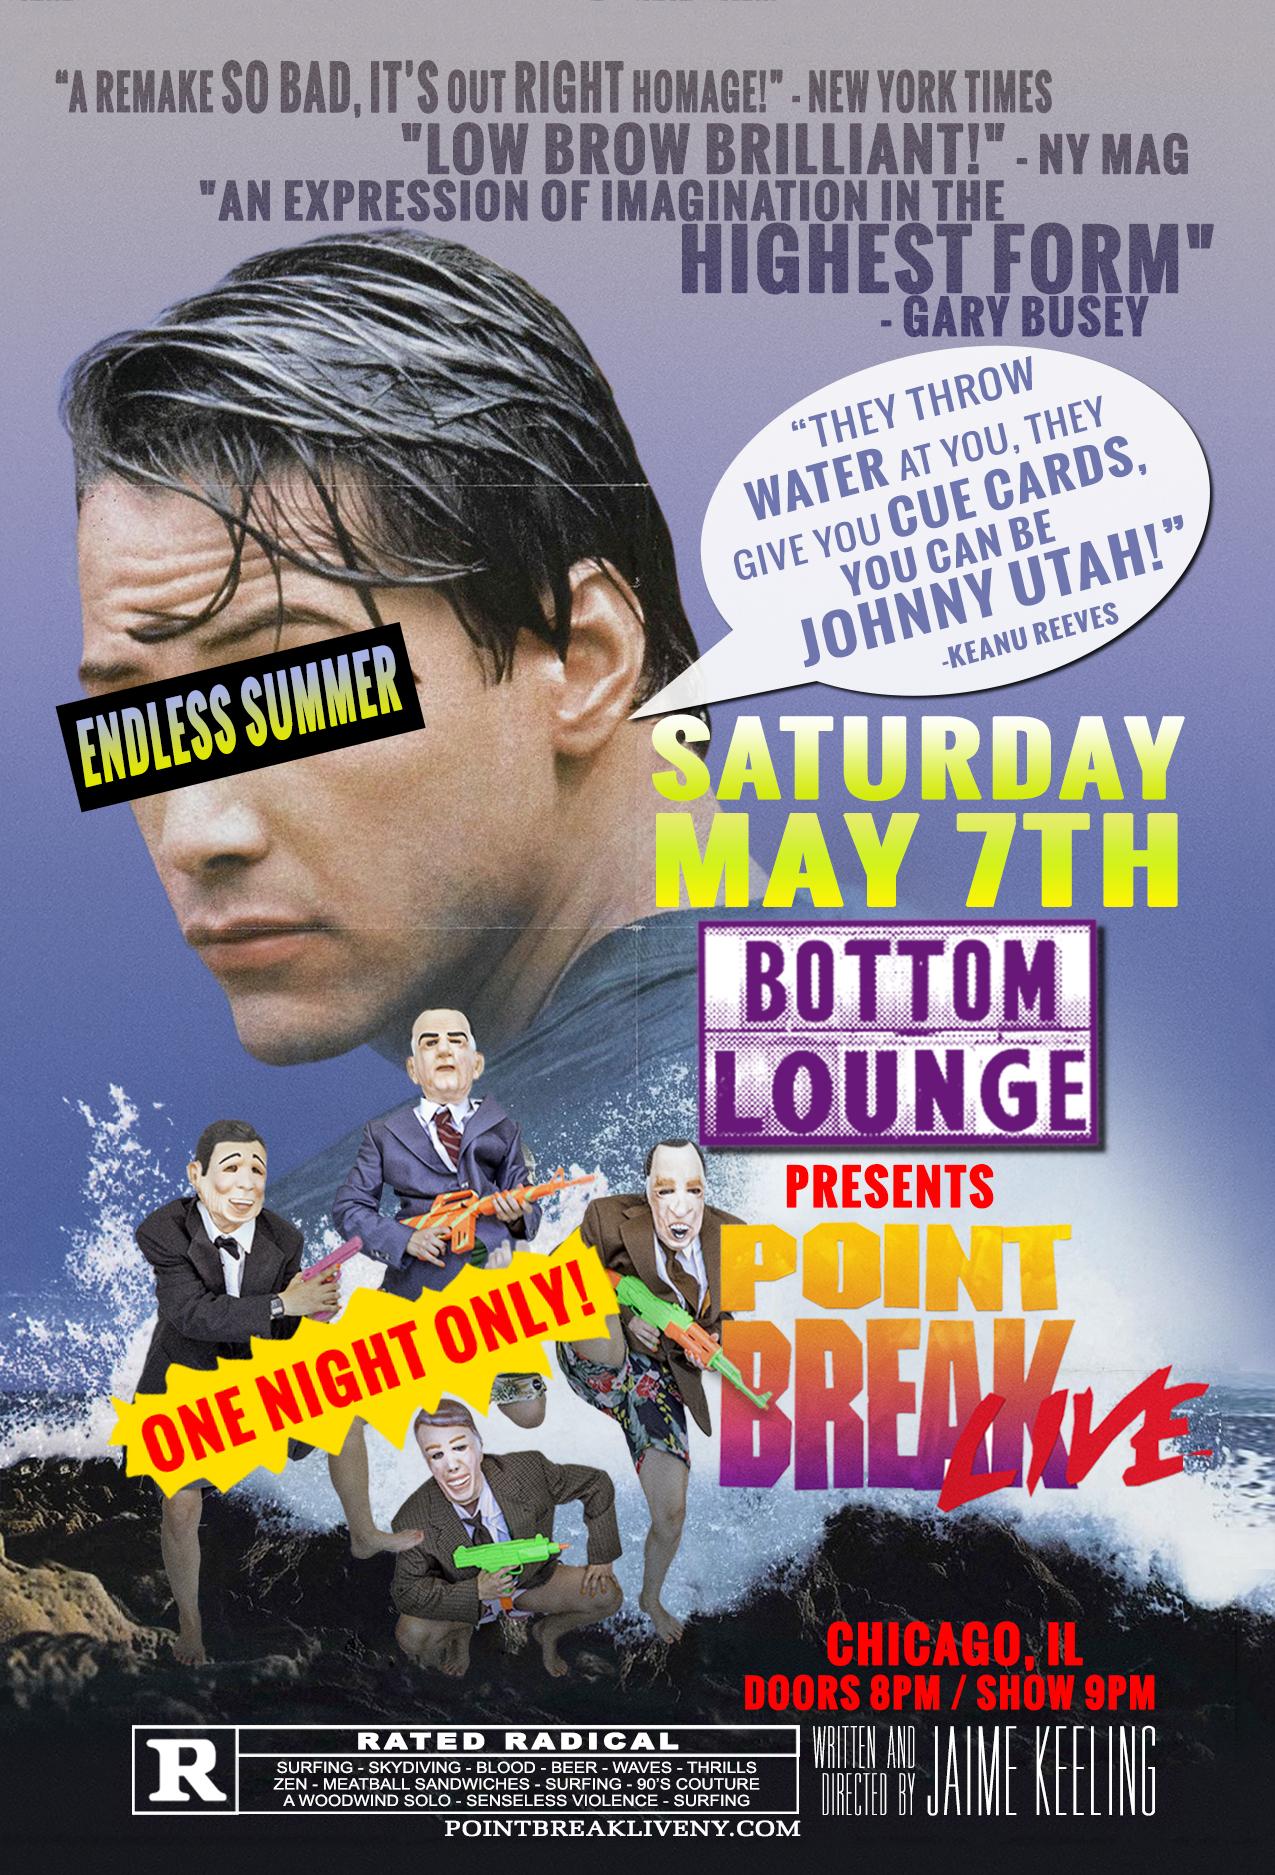 05_07_16_Bottom-Lounge_PBL!_Poster_GotPrint.jpg